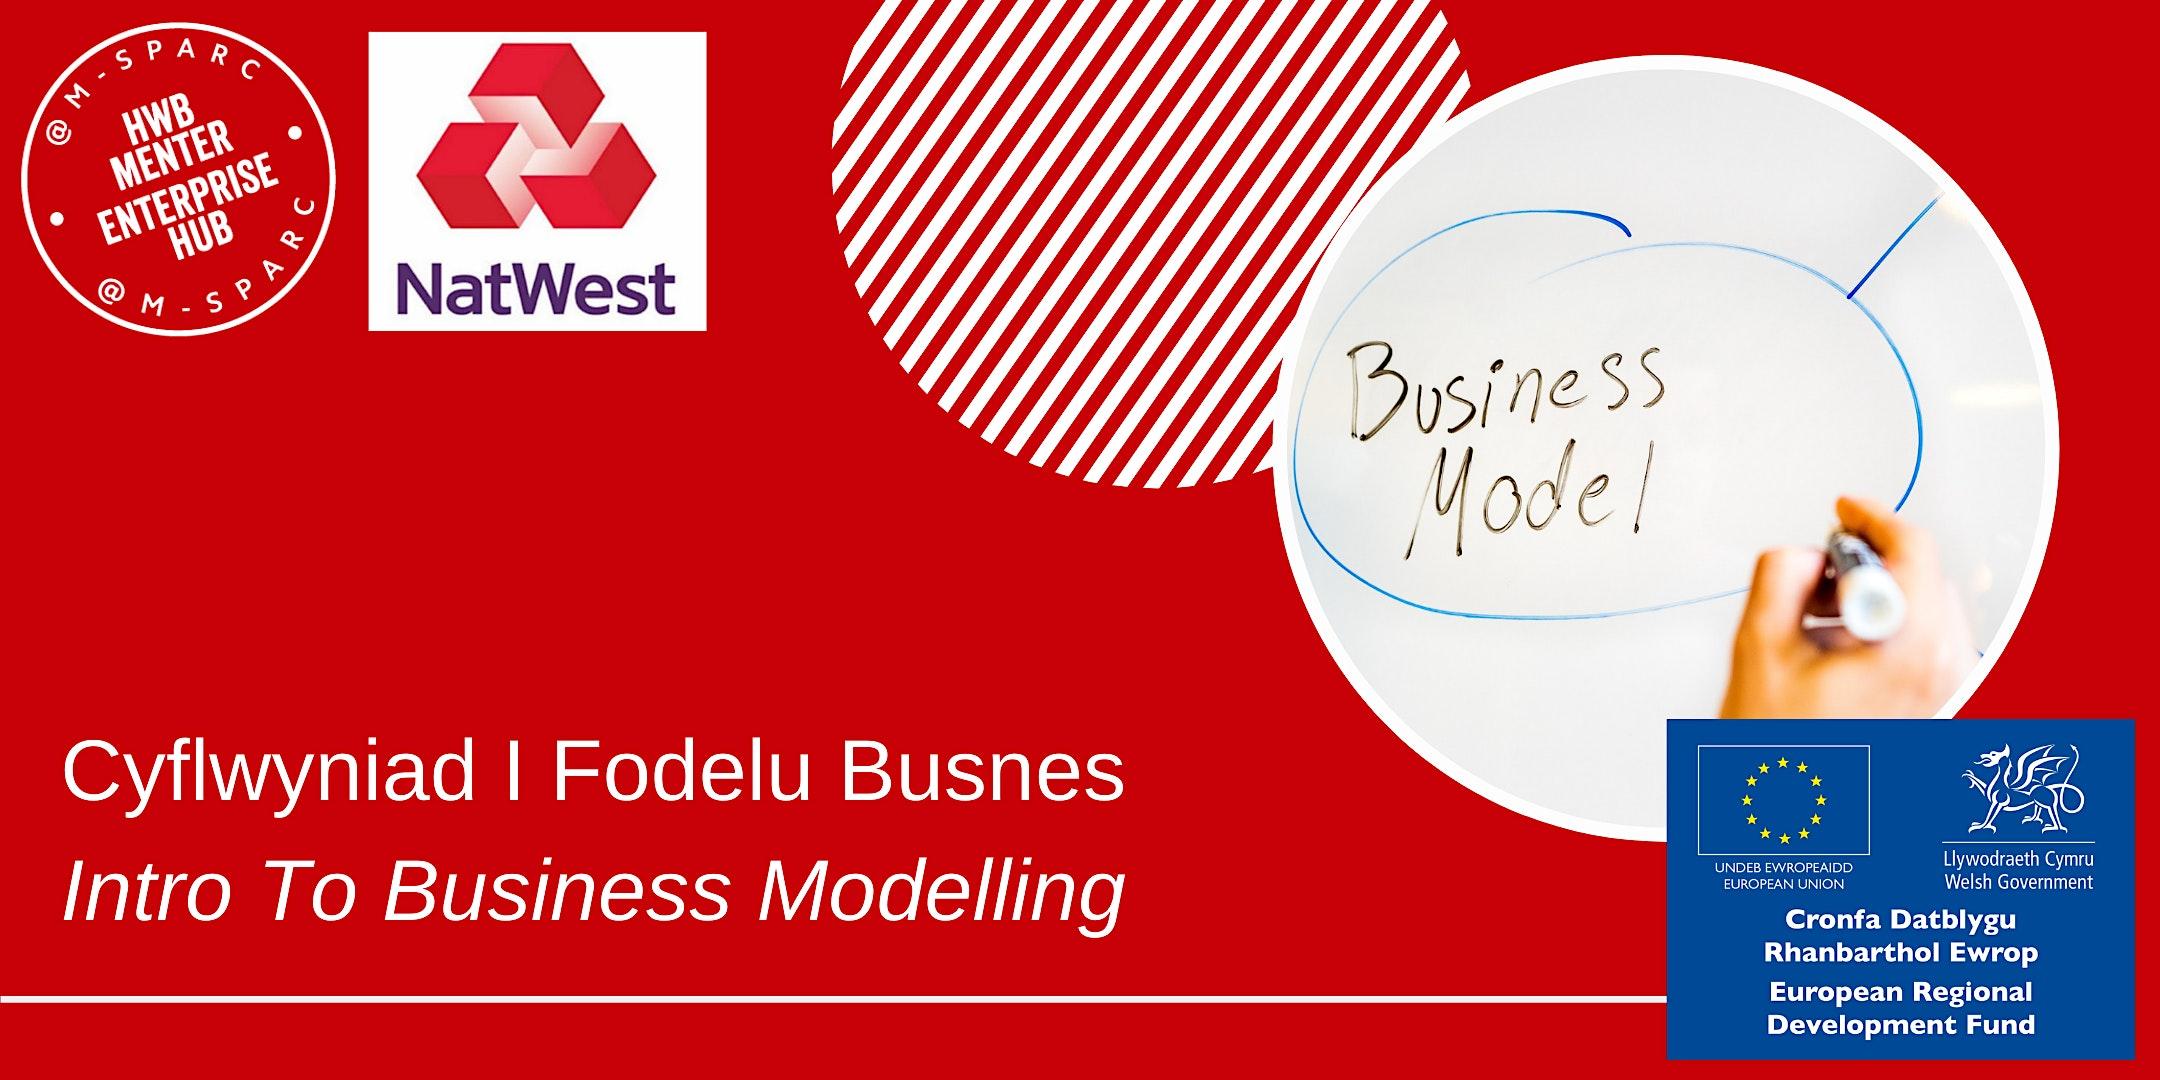 ONLINE - Cyflwyniad I Fodelu Busnes / Intro To Business Modelling